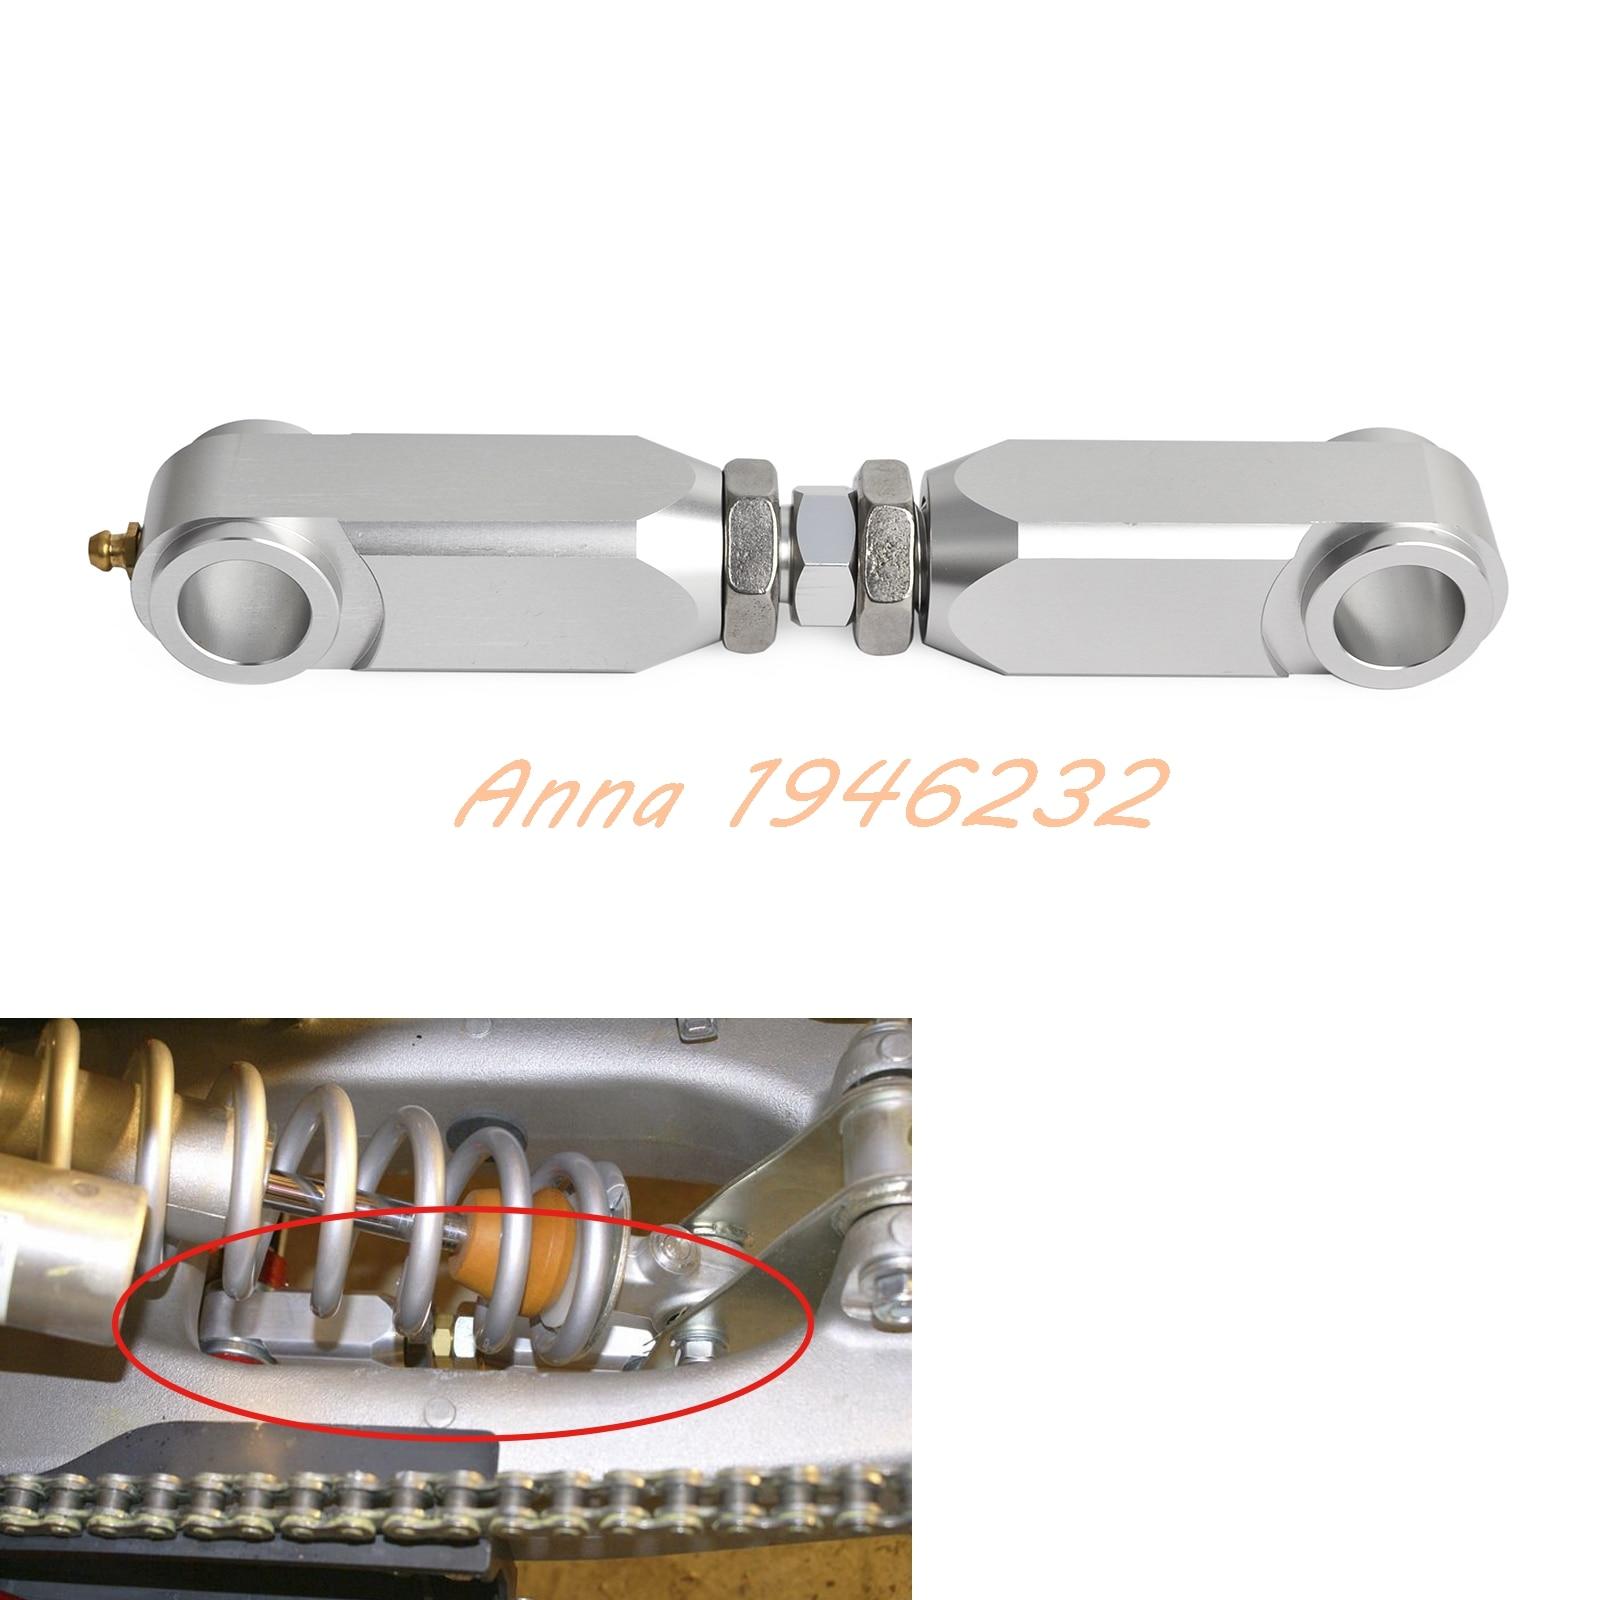 ATV Adjustable Rear Lowering Kit Arm Relay Connecting Rod For Yamaha Raptor 350 660 700 YFM350 YFM660R YFM700